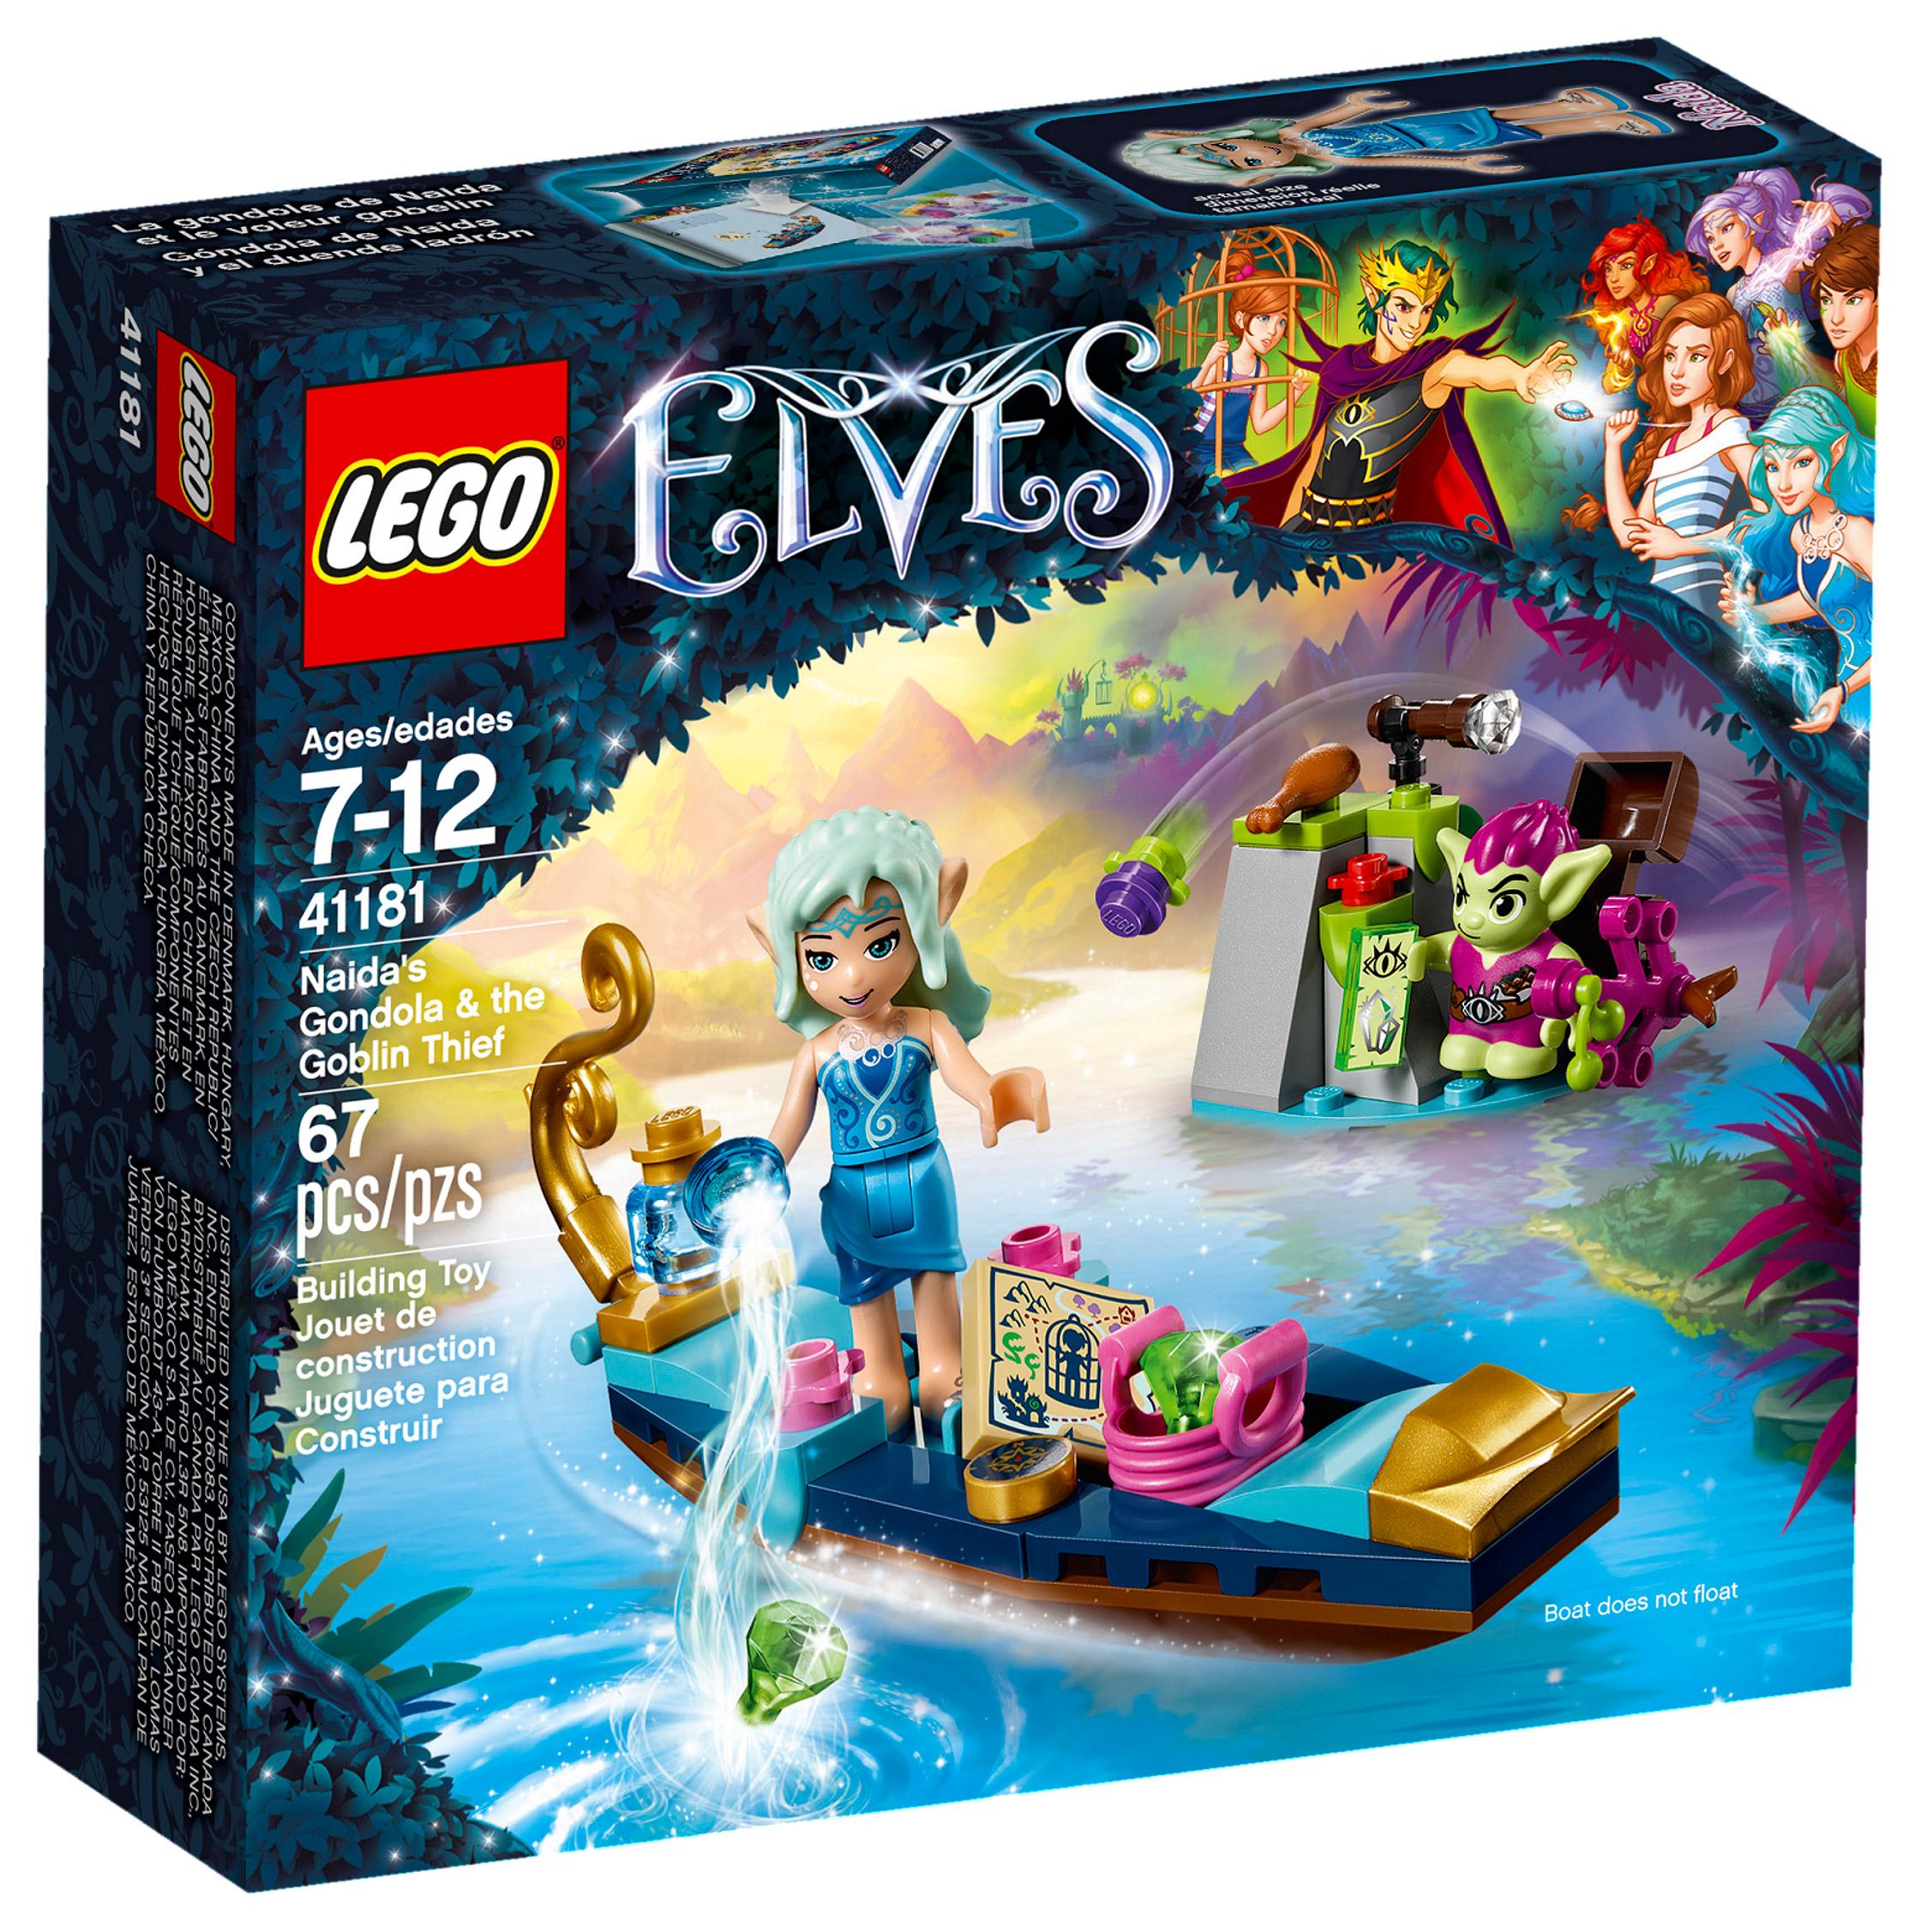 Lego 41181 Gobelin Naida Voleur La Elves Le Gondole De Et xrhtdsQC